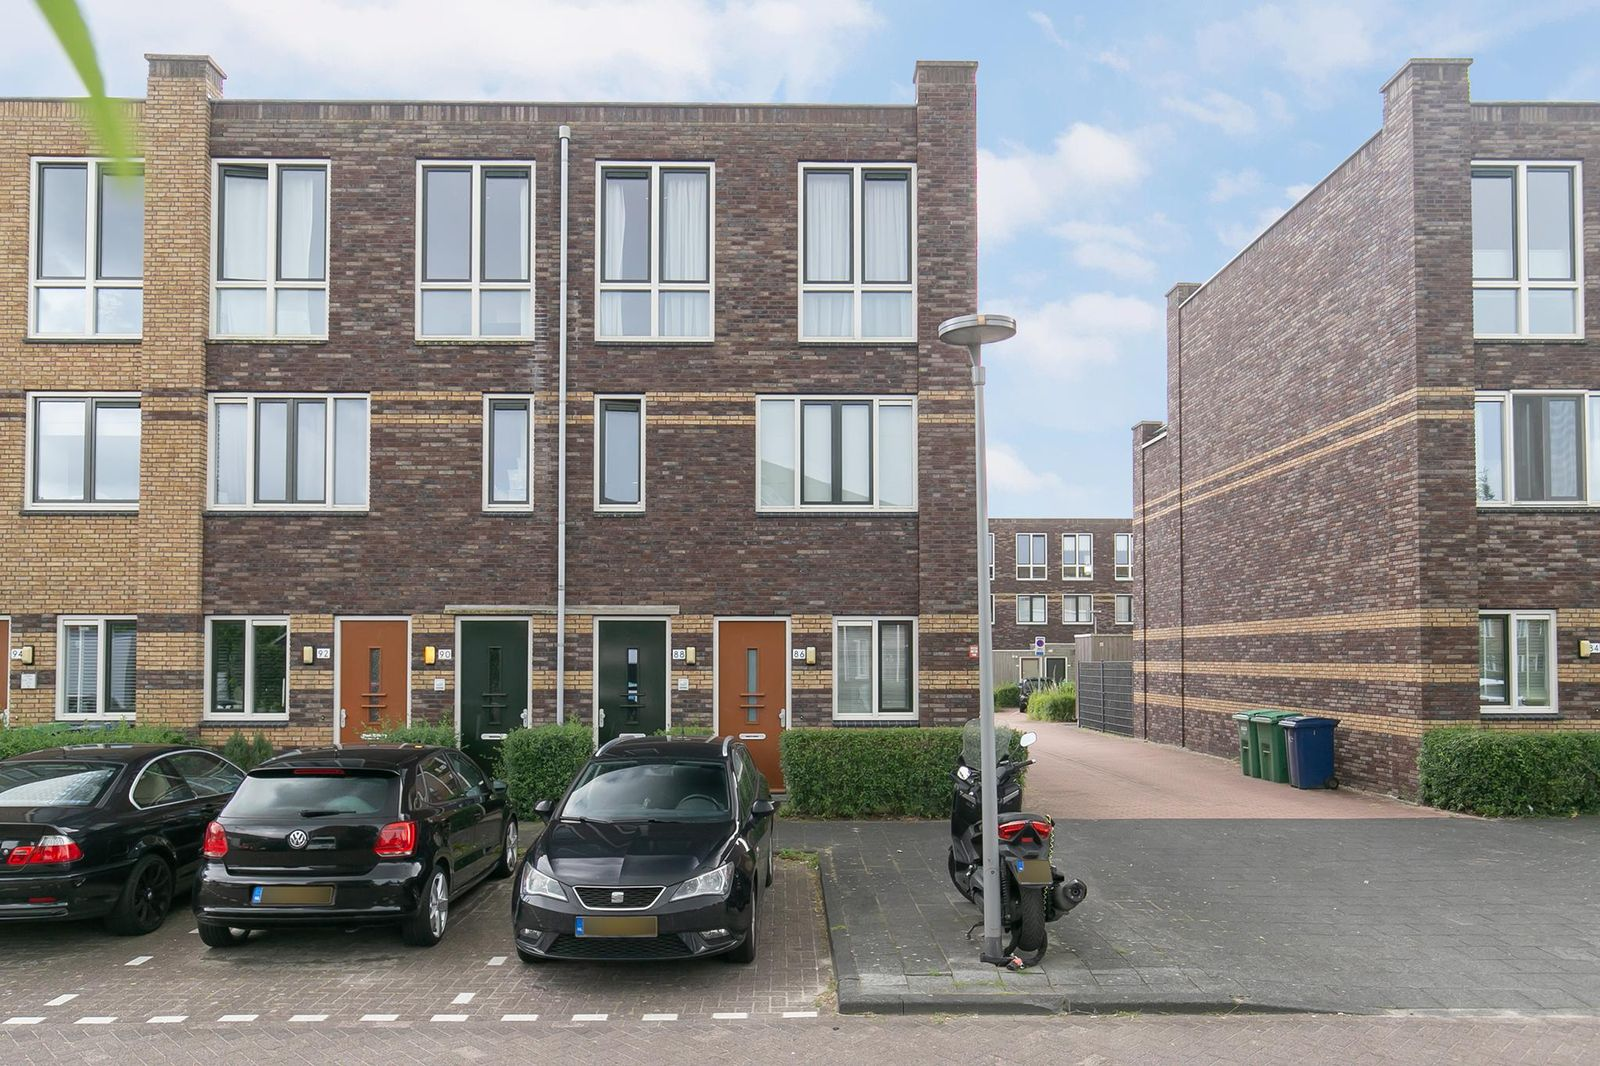 Anubisstraat 86, Almere